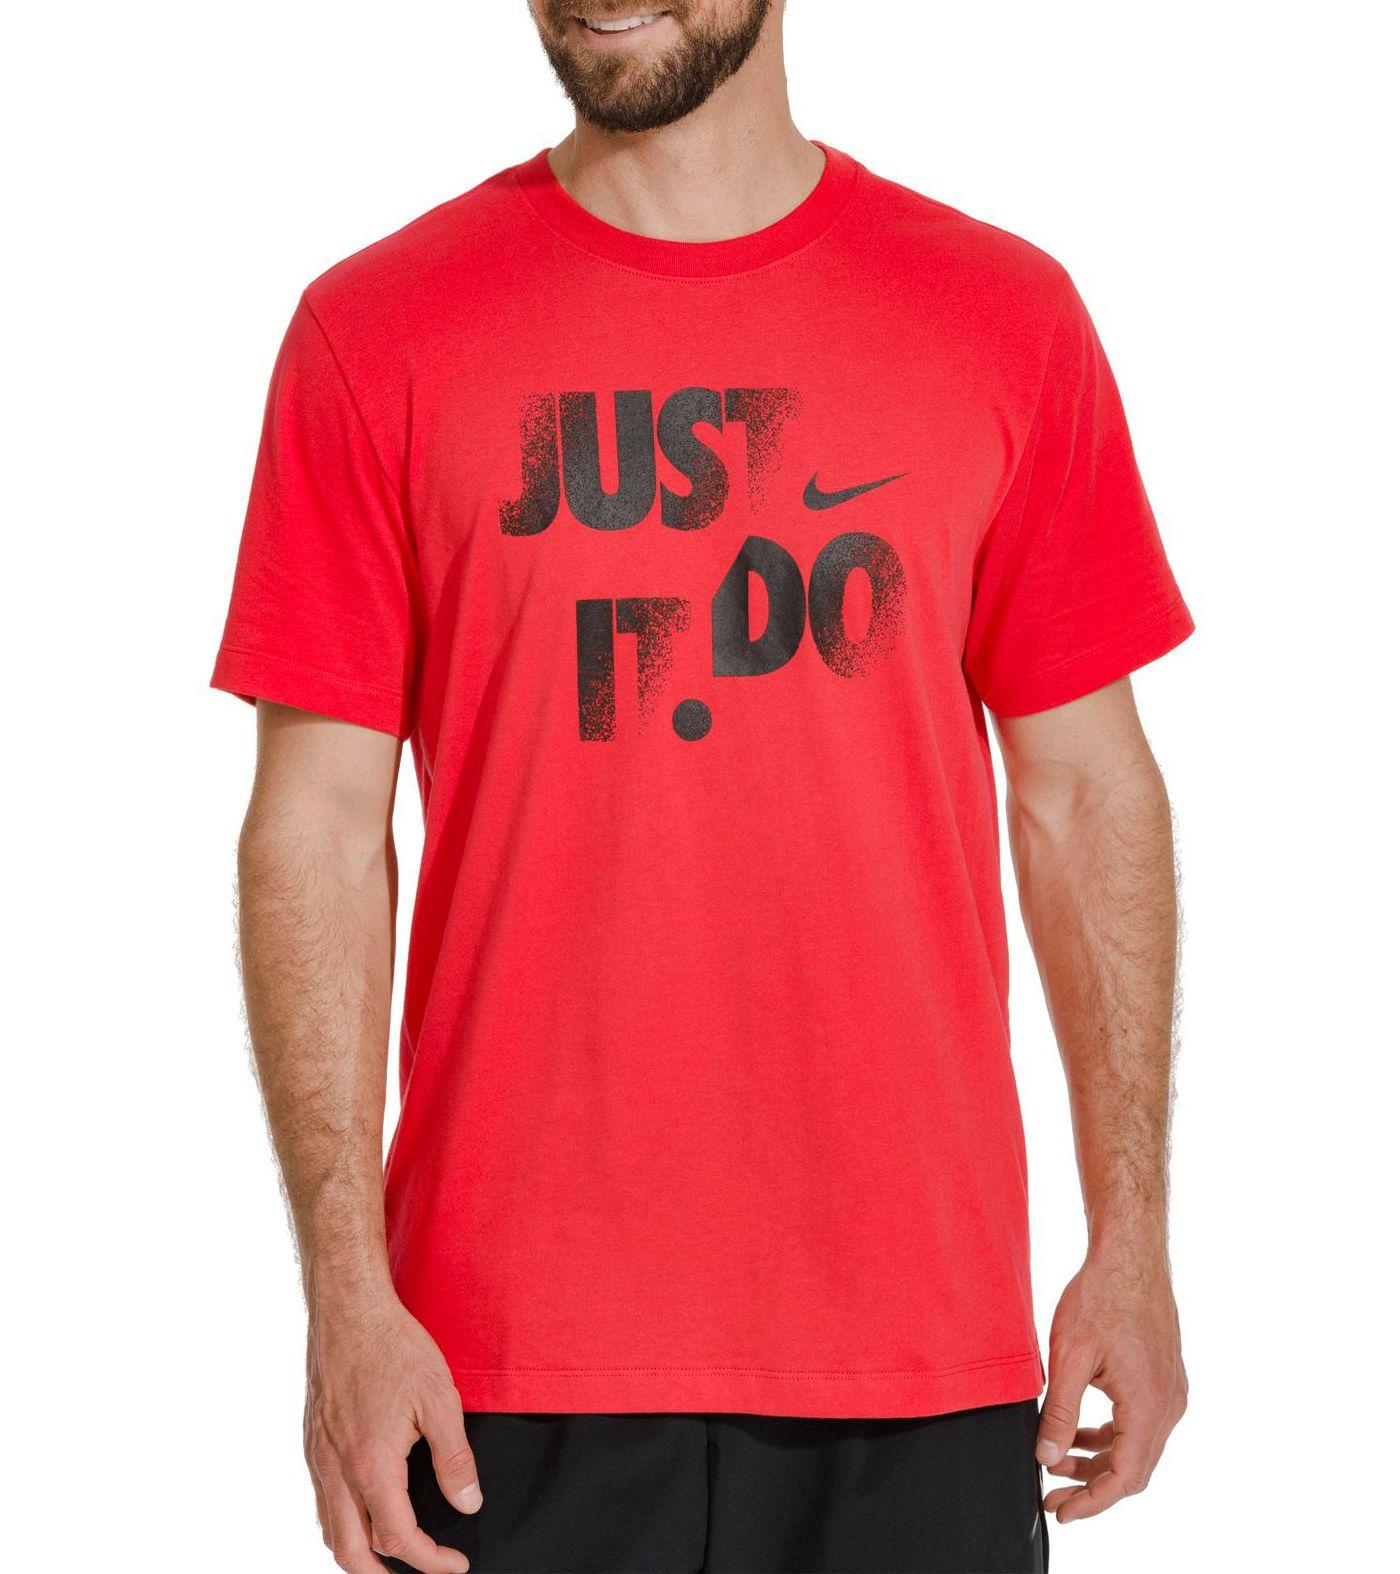 Nike Men's Dri-FIT Cotton Just Do It Graphic T-Shirt